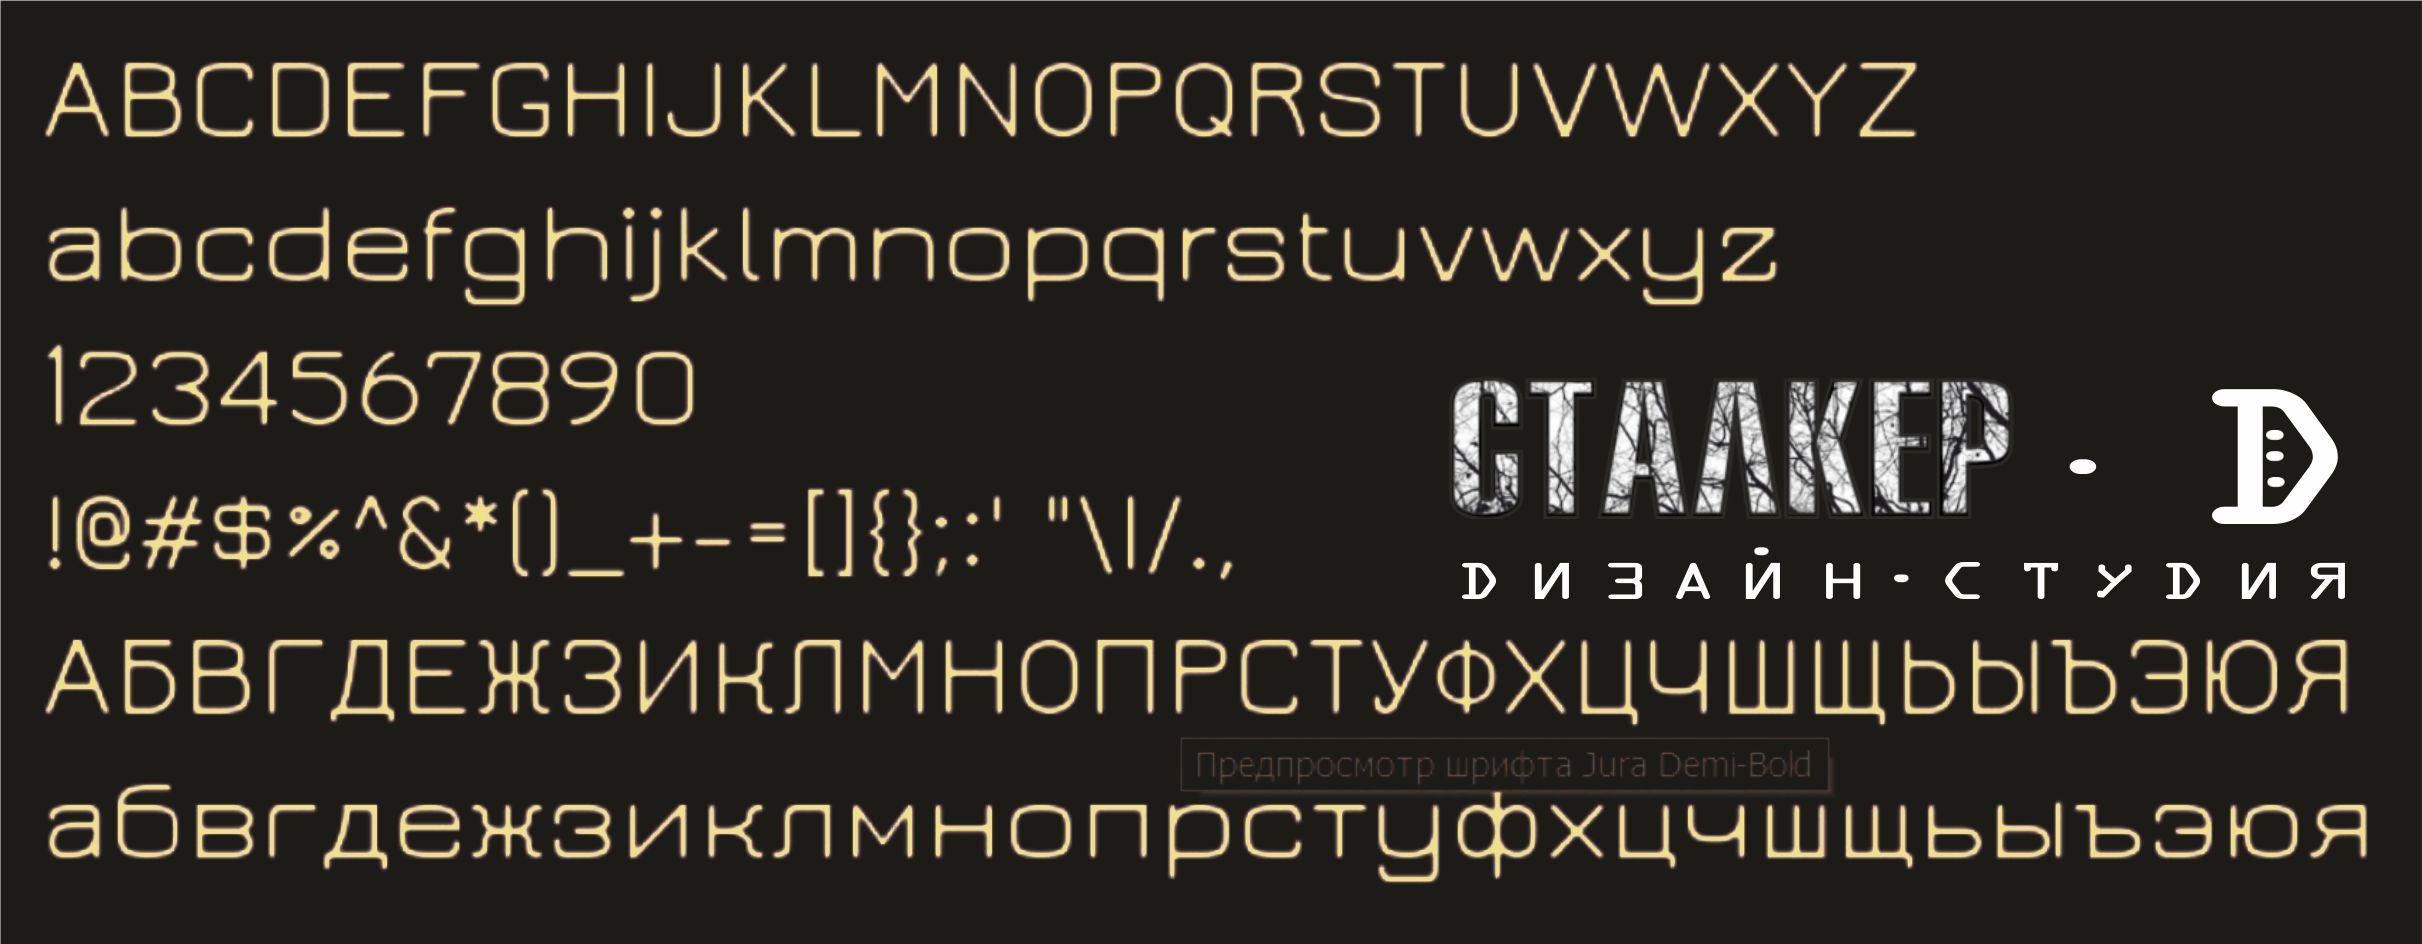 Дизайн-студия Stalker-D